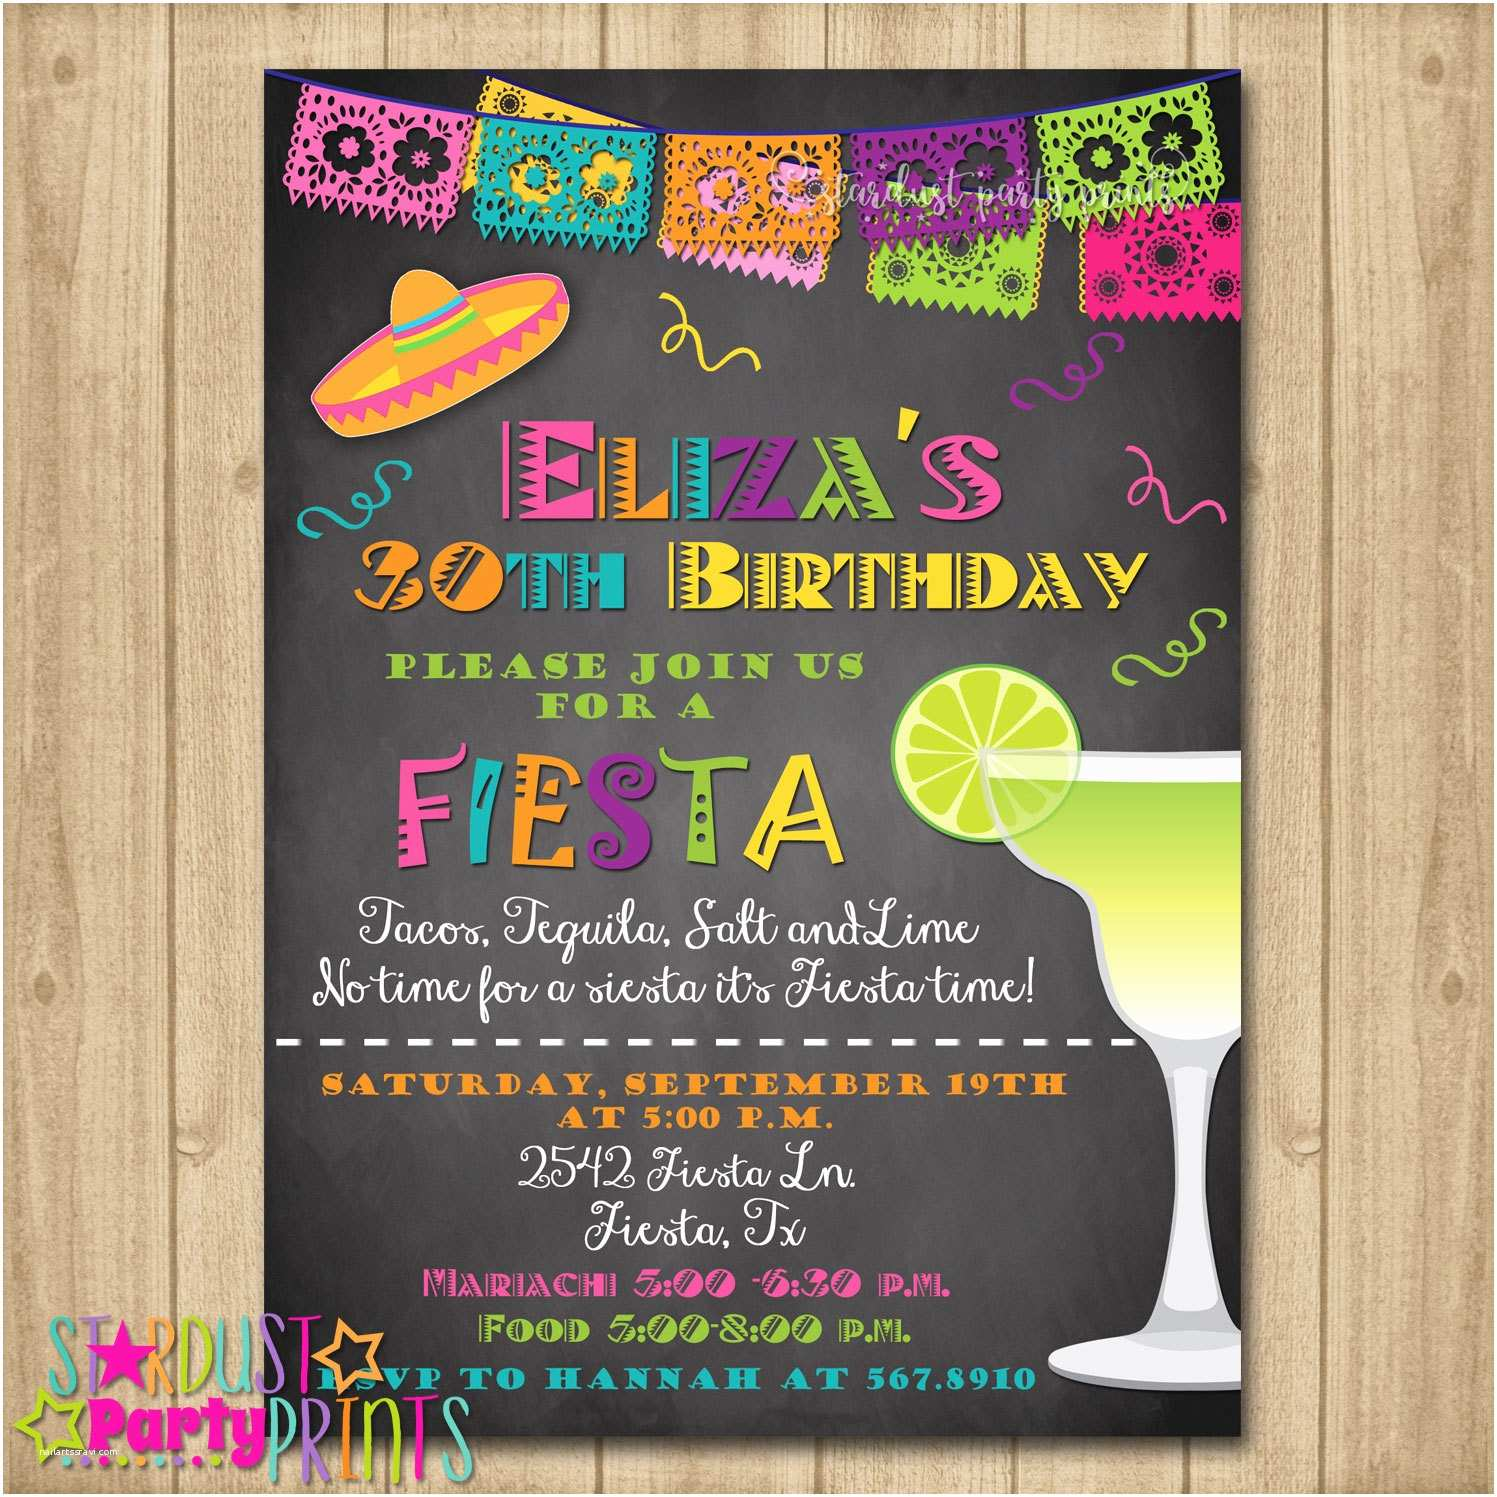 Fiesta Party Invitations Fiesta Birthday Invitation 30th Birthday Fiesta Invitation